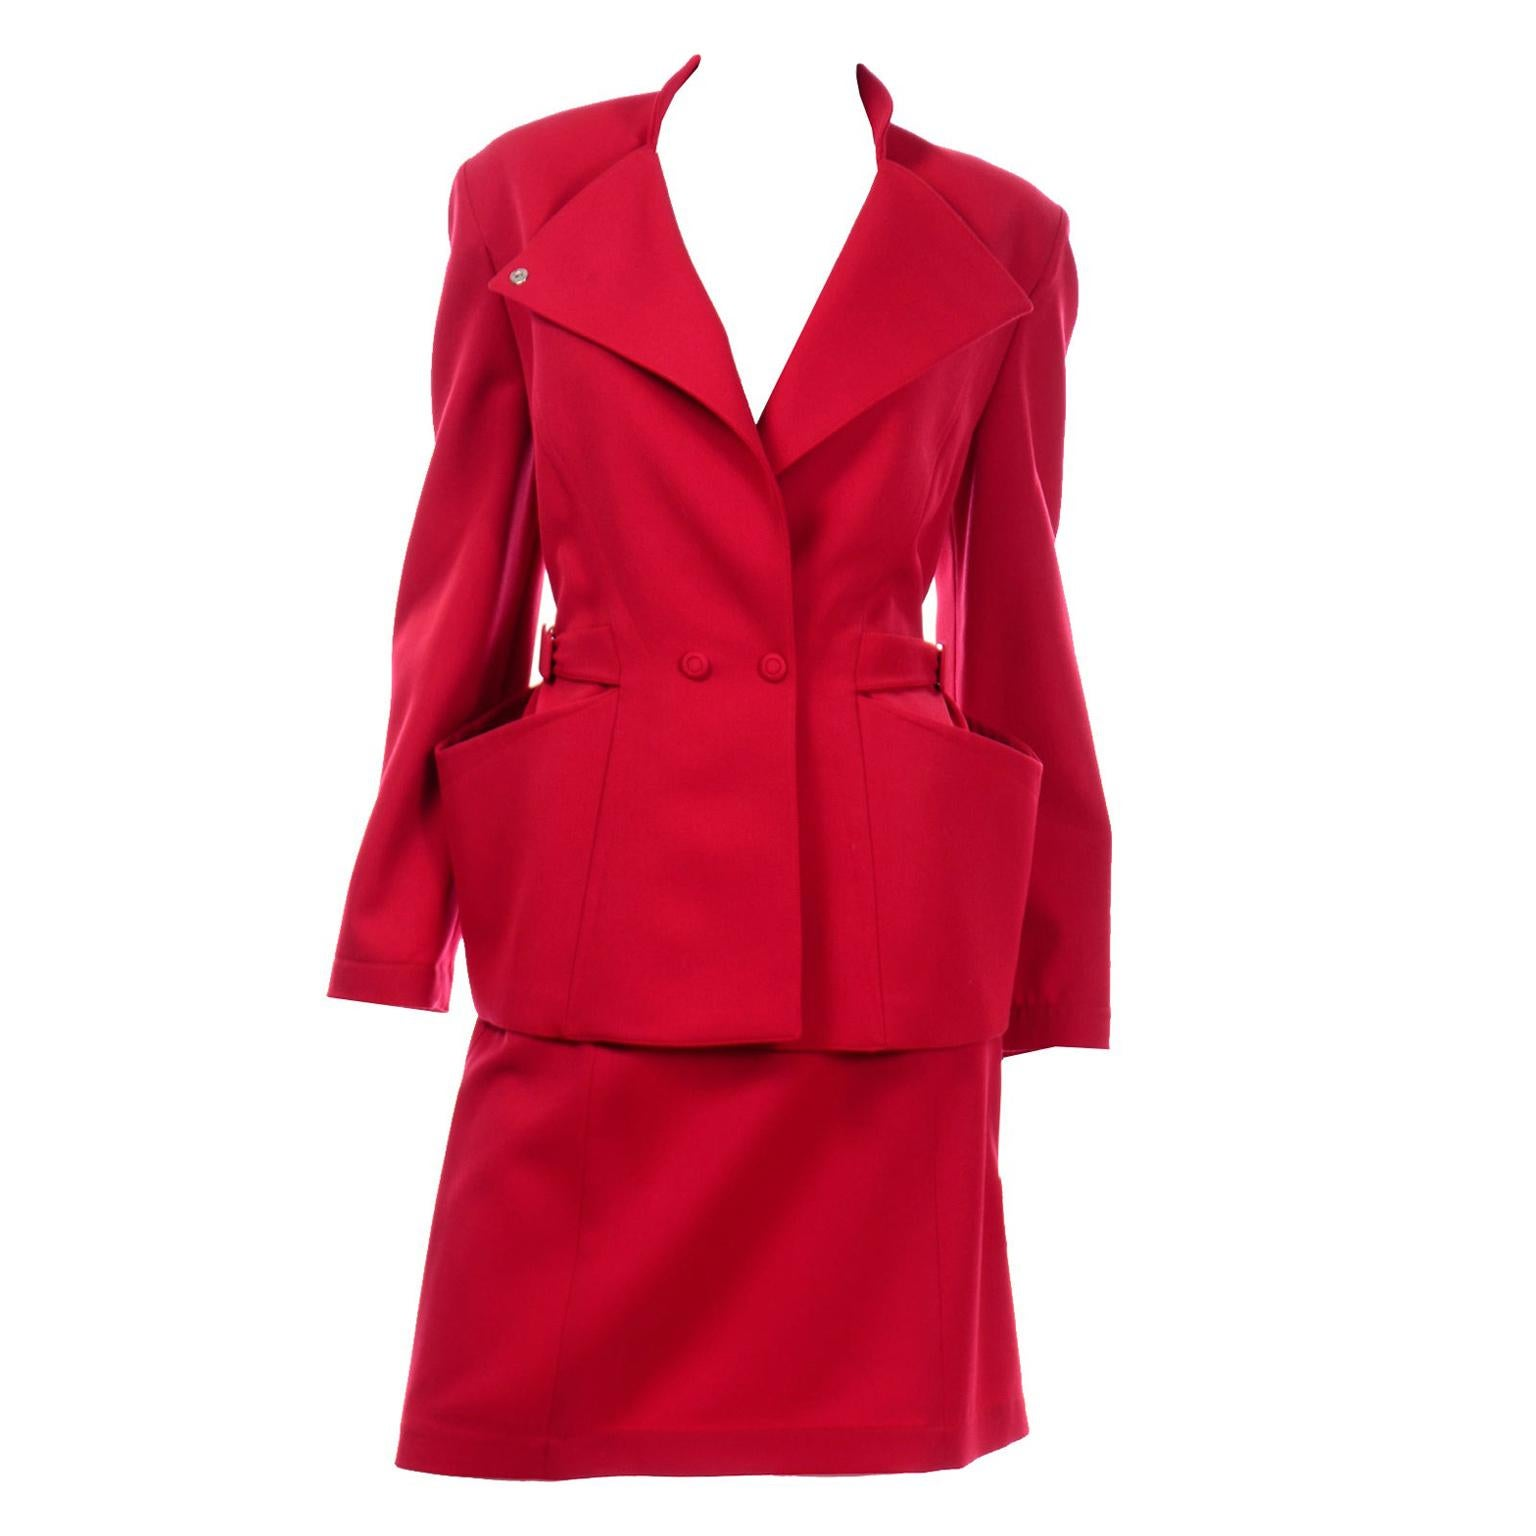 Vintage Thierry Mugler Paris Cherry Red Wool Skirt & Jacket Suit